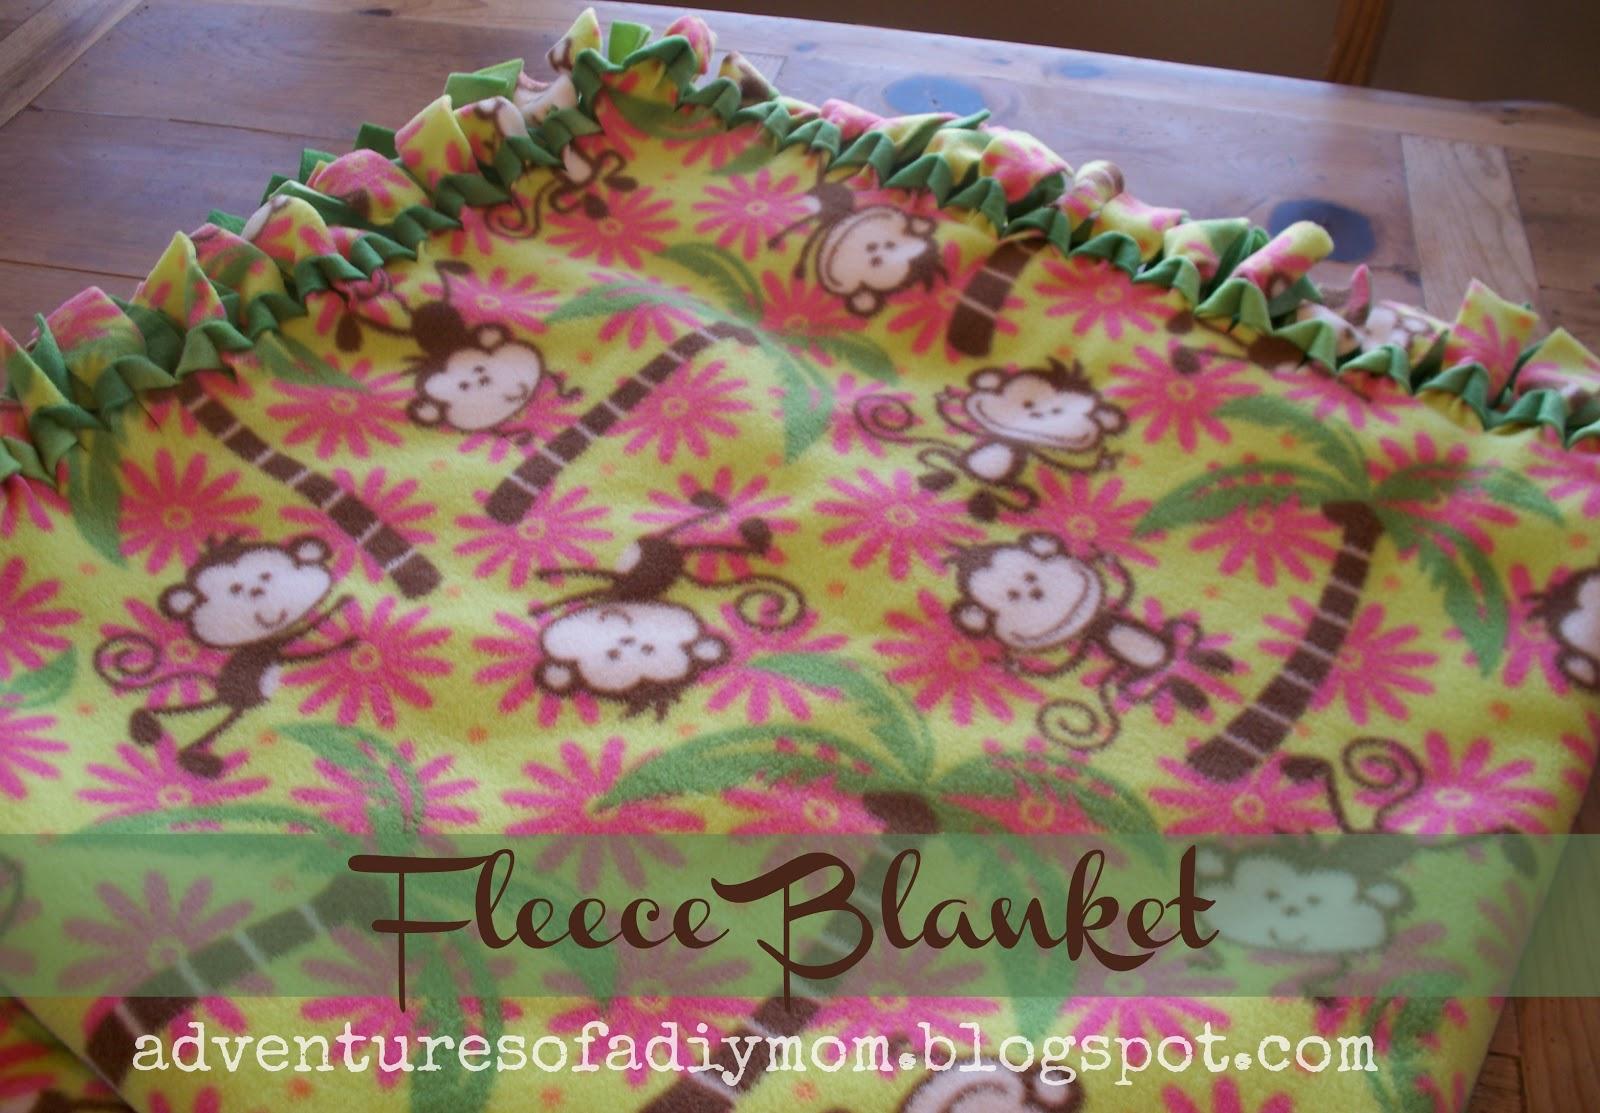 How to Make a No Sew Fleece Blanket - Adventures of a DIY Mom : no sew quilts - Adamdwight.com